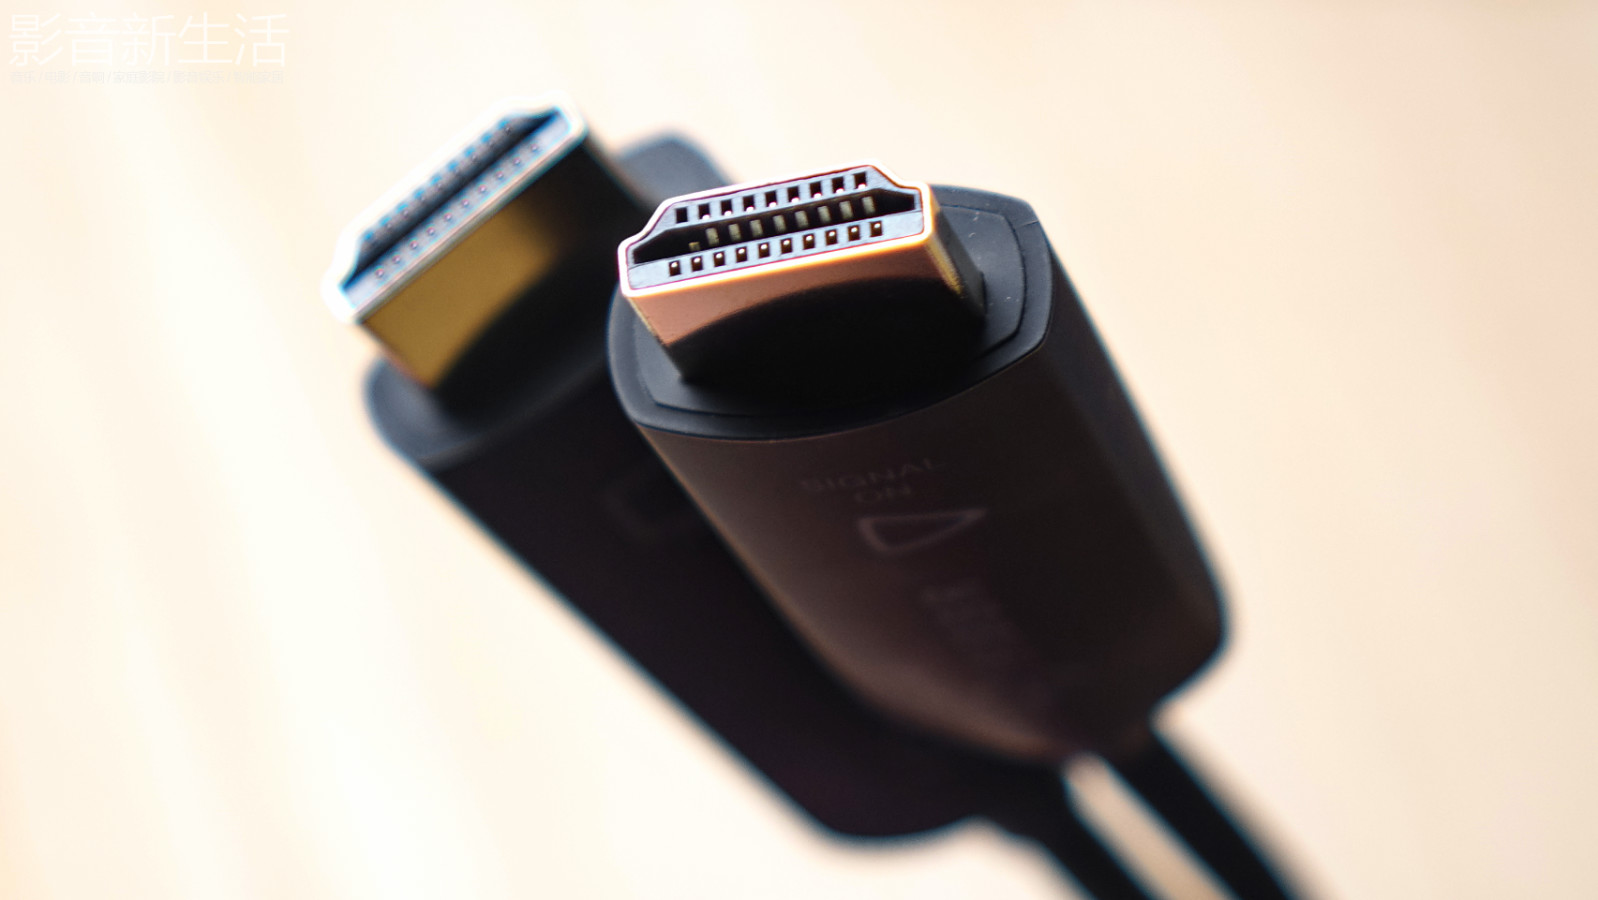 "fibbr pro hdmi 10 - 推荐   ""衰减率低、可弯折、耐用度高,高品质的HDMI线""FIBBR Ultra Pro 光纤HDMI线"